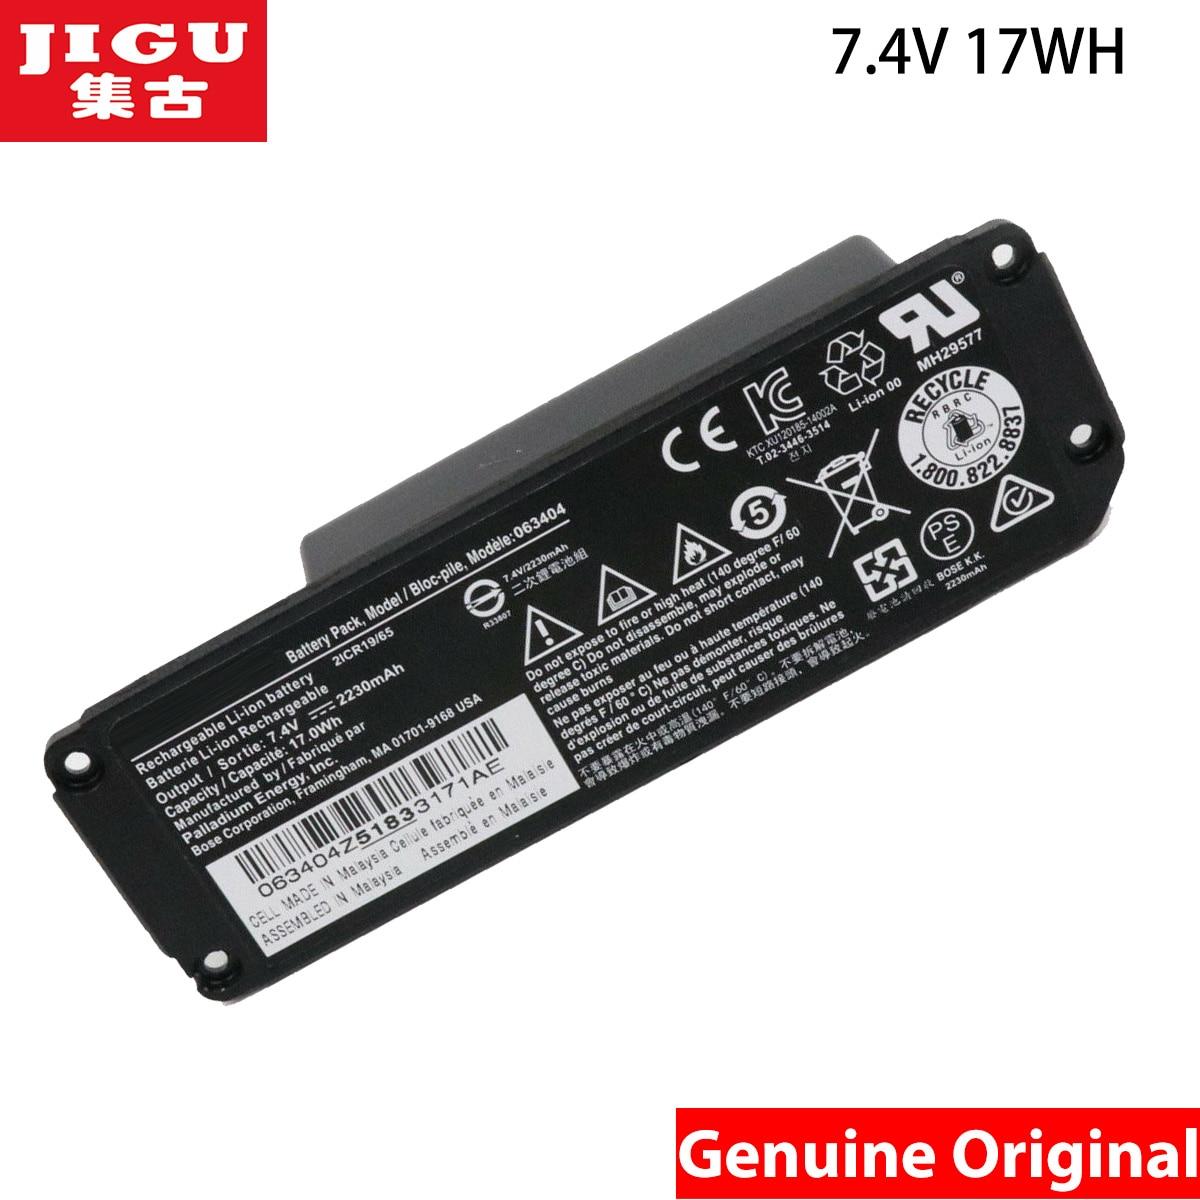 JIGU New Original Battery 061384 061385 061386 063404 063287 For Bose SoundLink Mini 1 Bluetooth Mobile Speaker